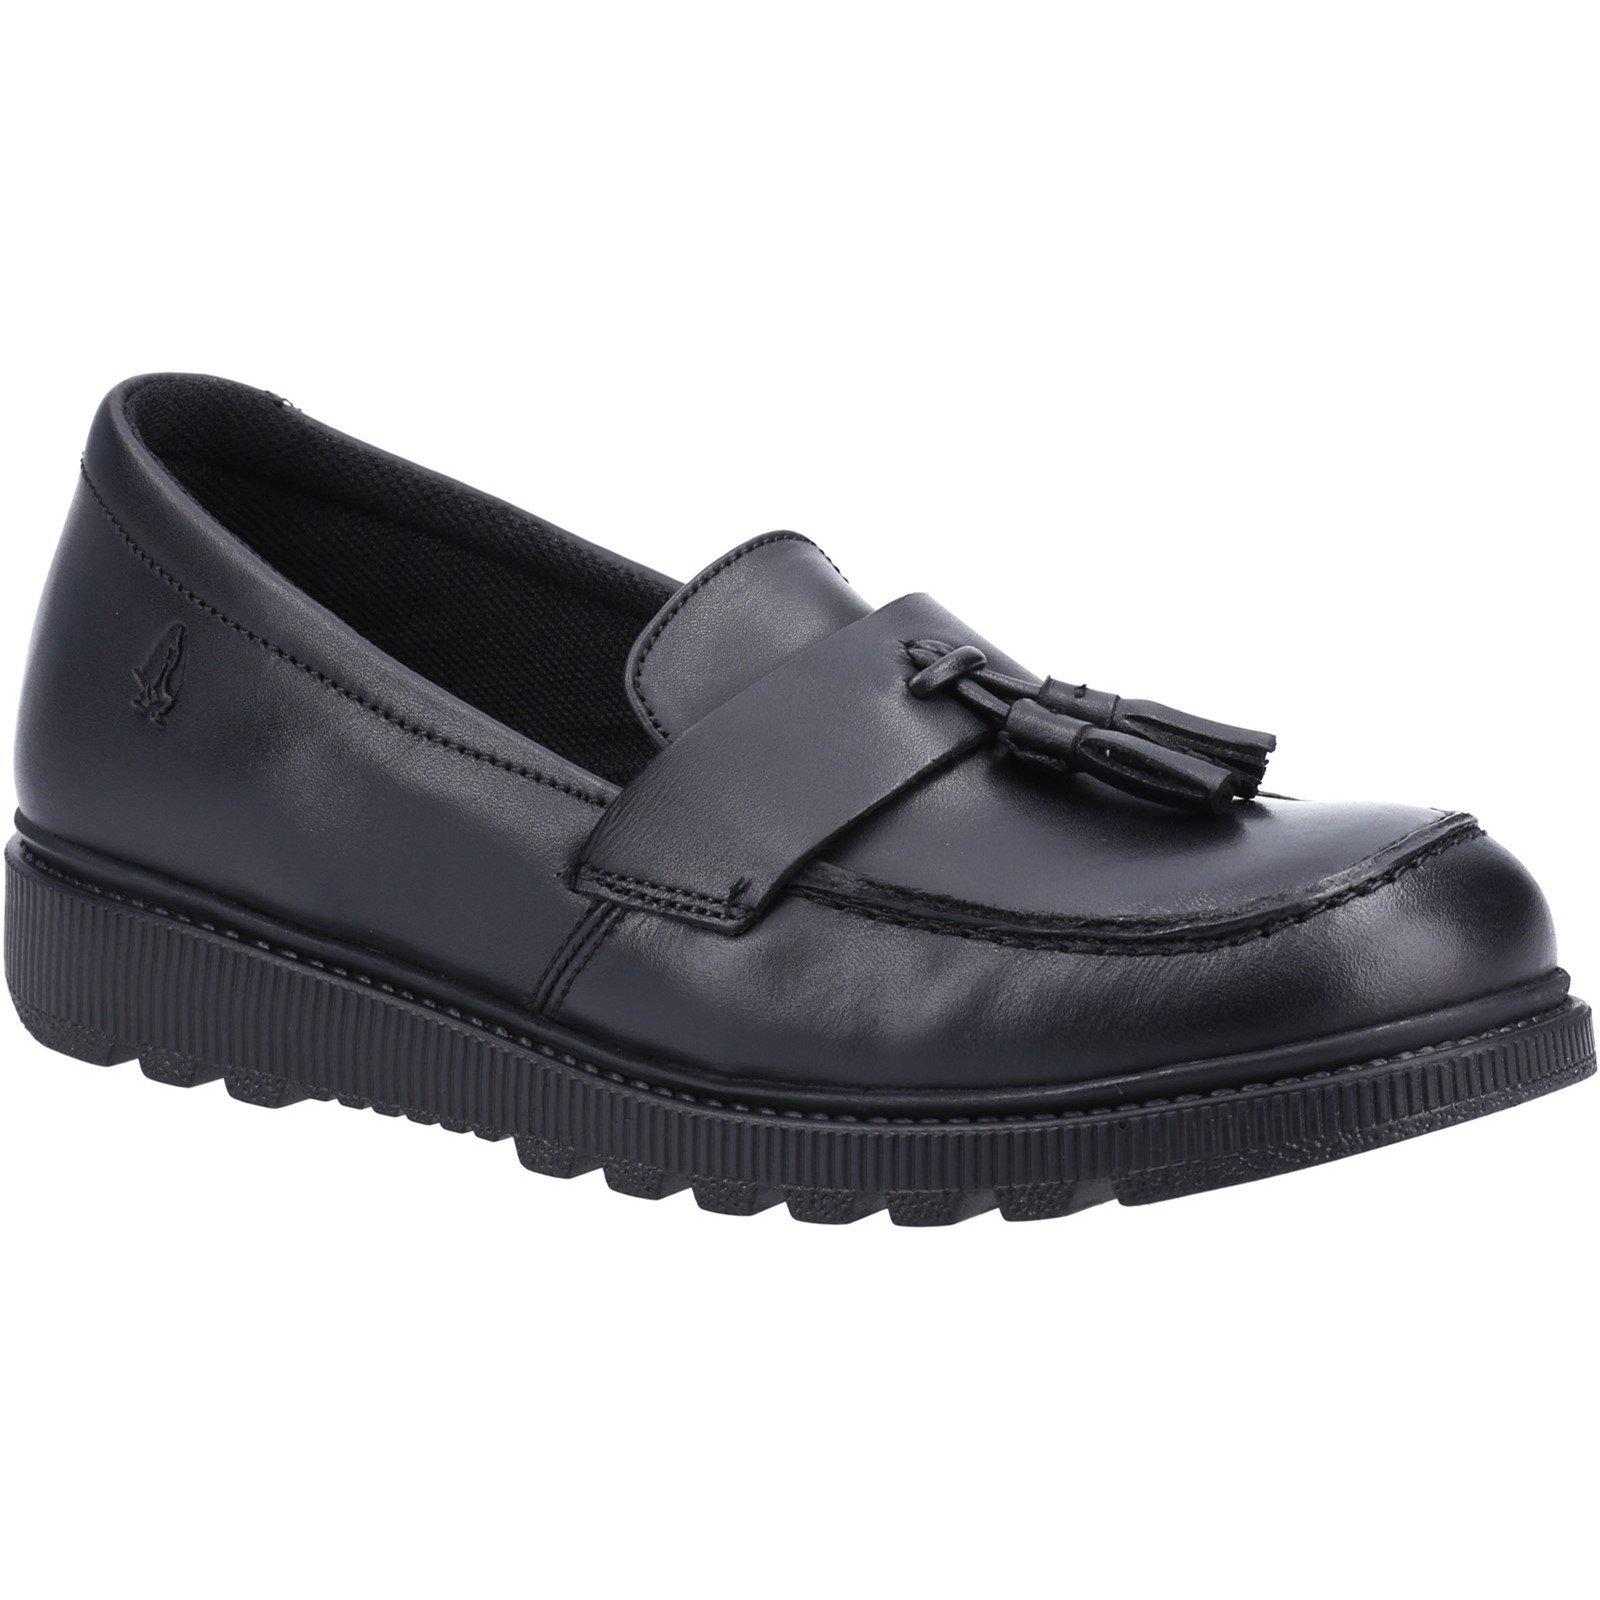 Hush Puppies Kid's Faye Junior School Shoe Black 30843 - Black 1